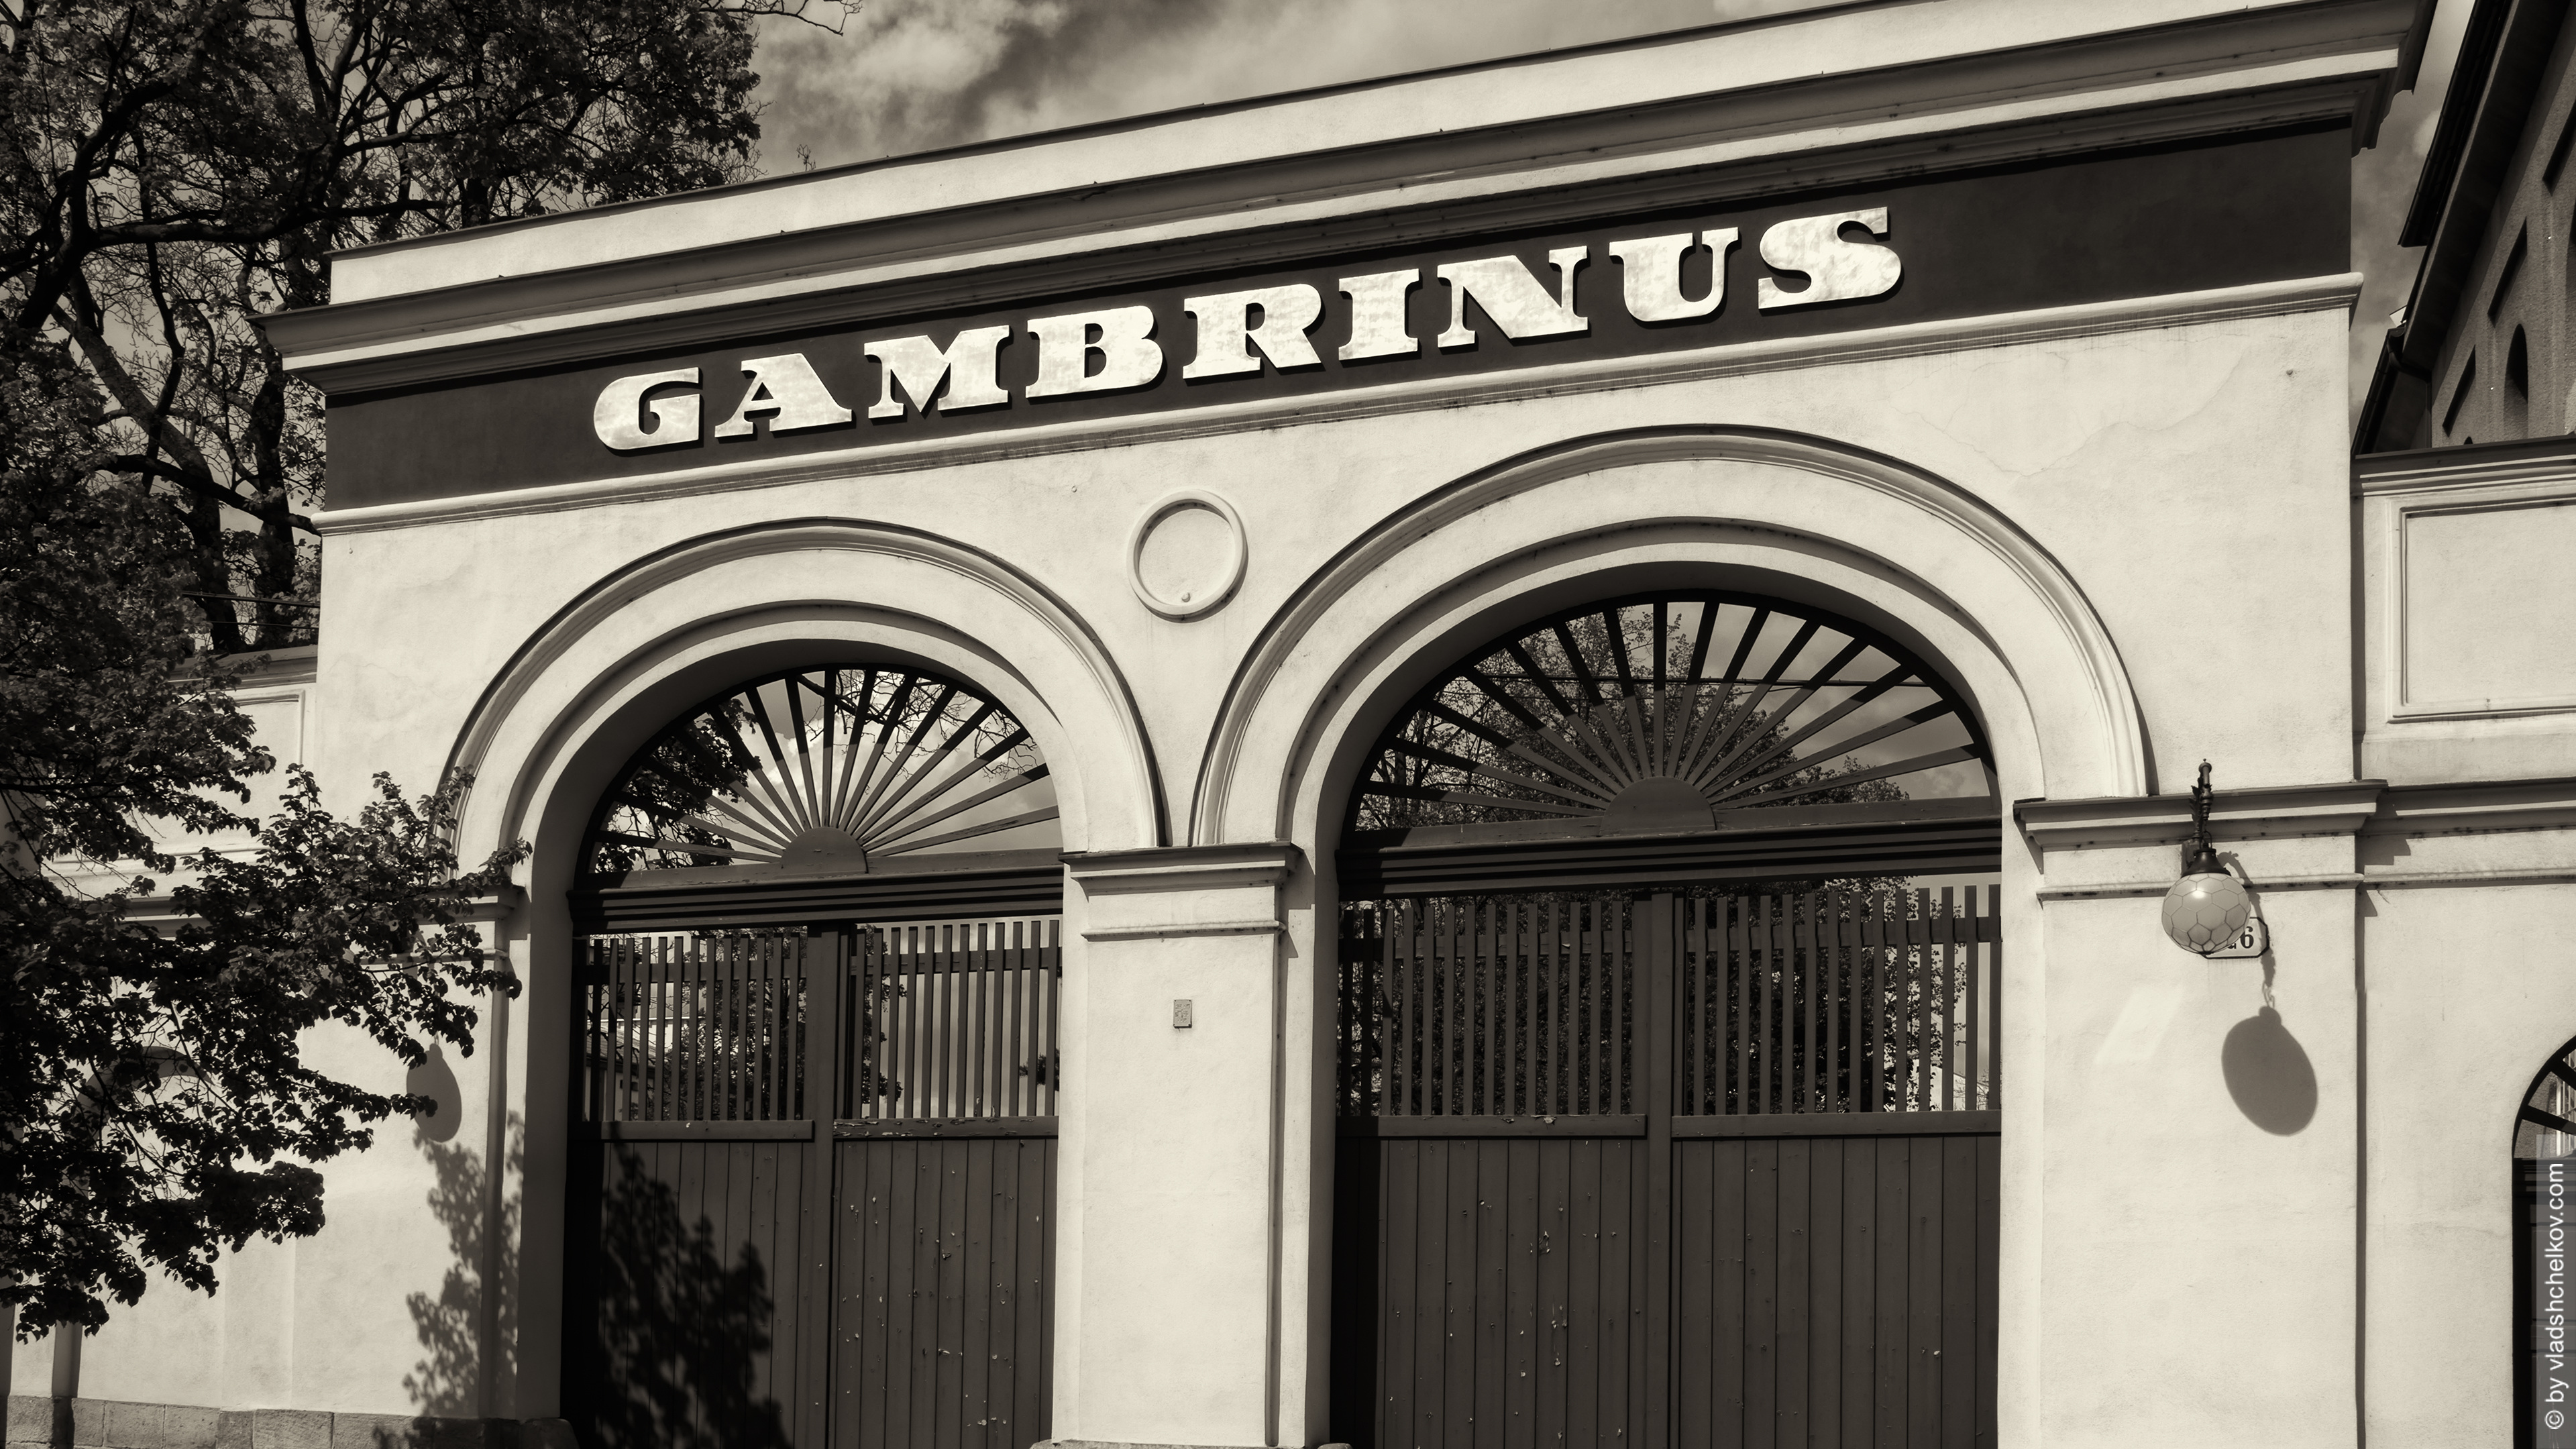 gambrinus_wallpaper